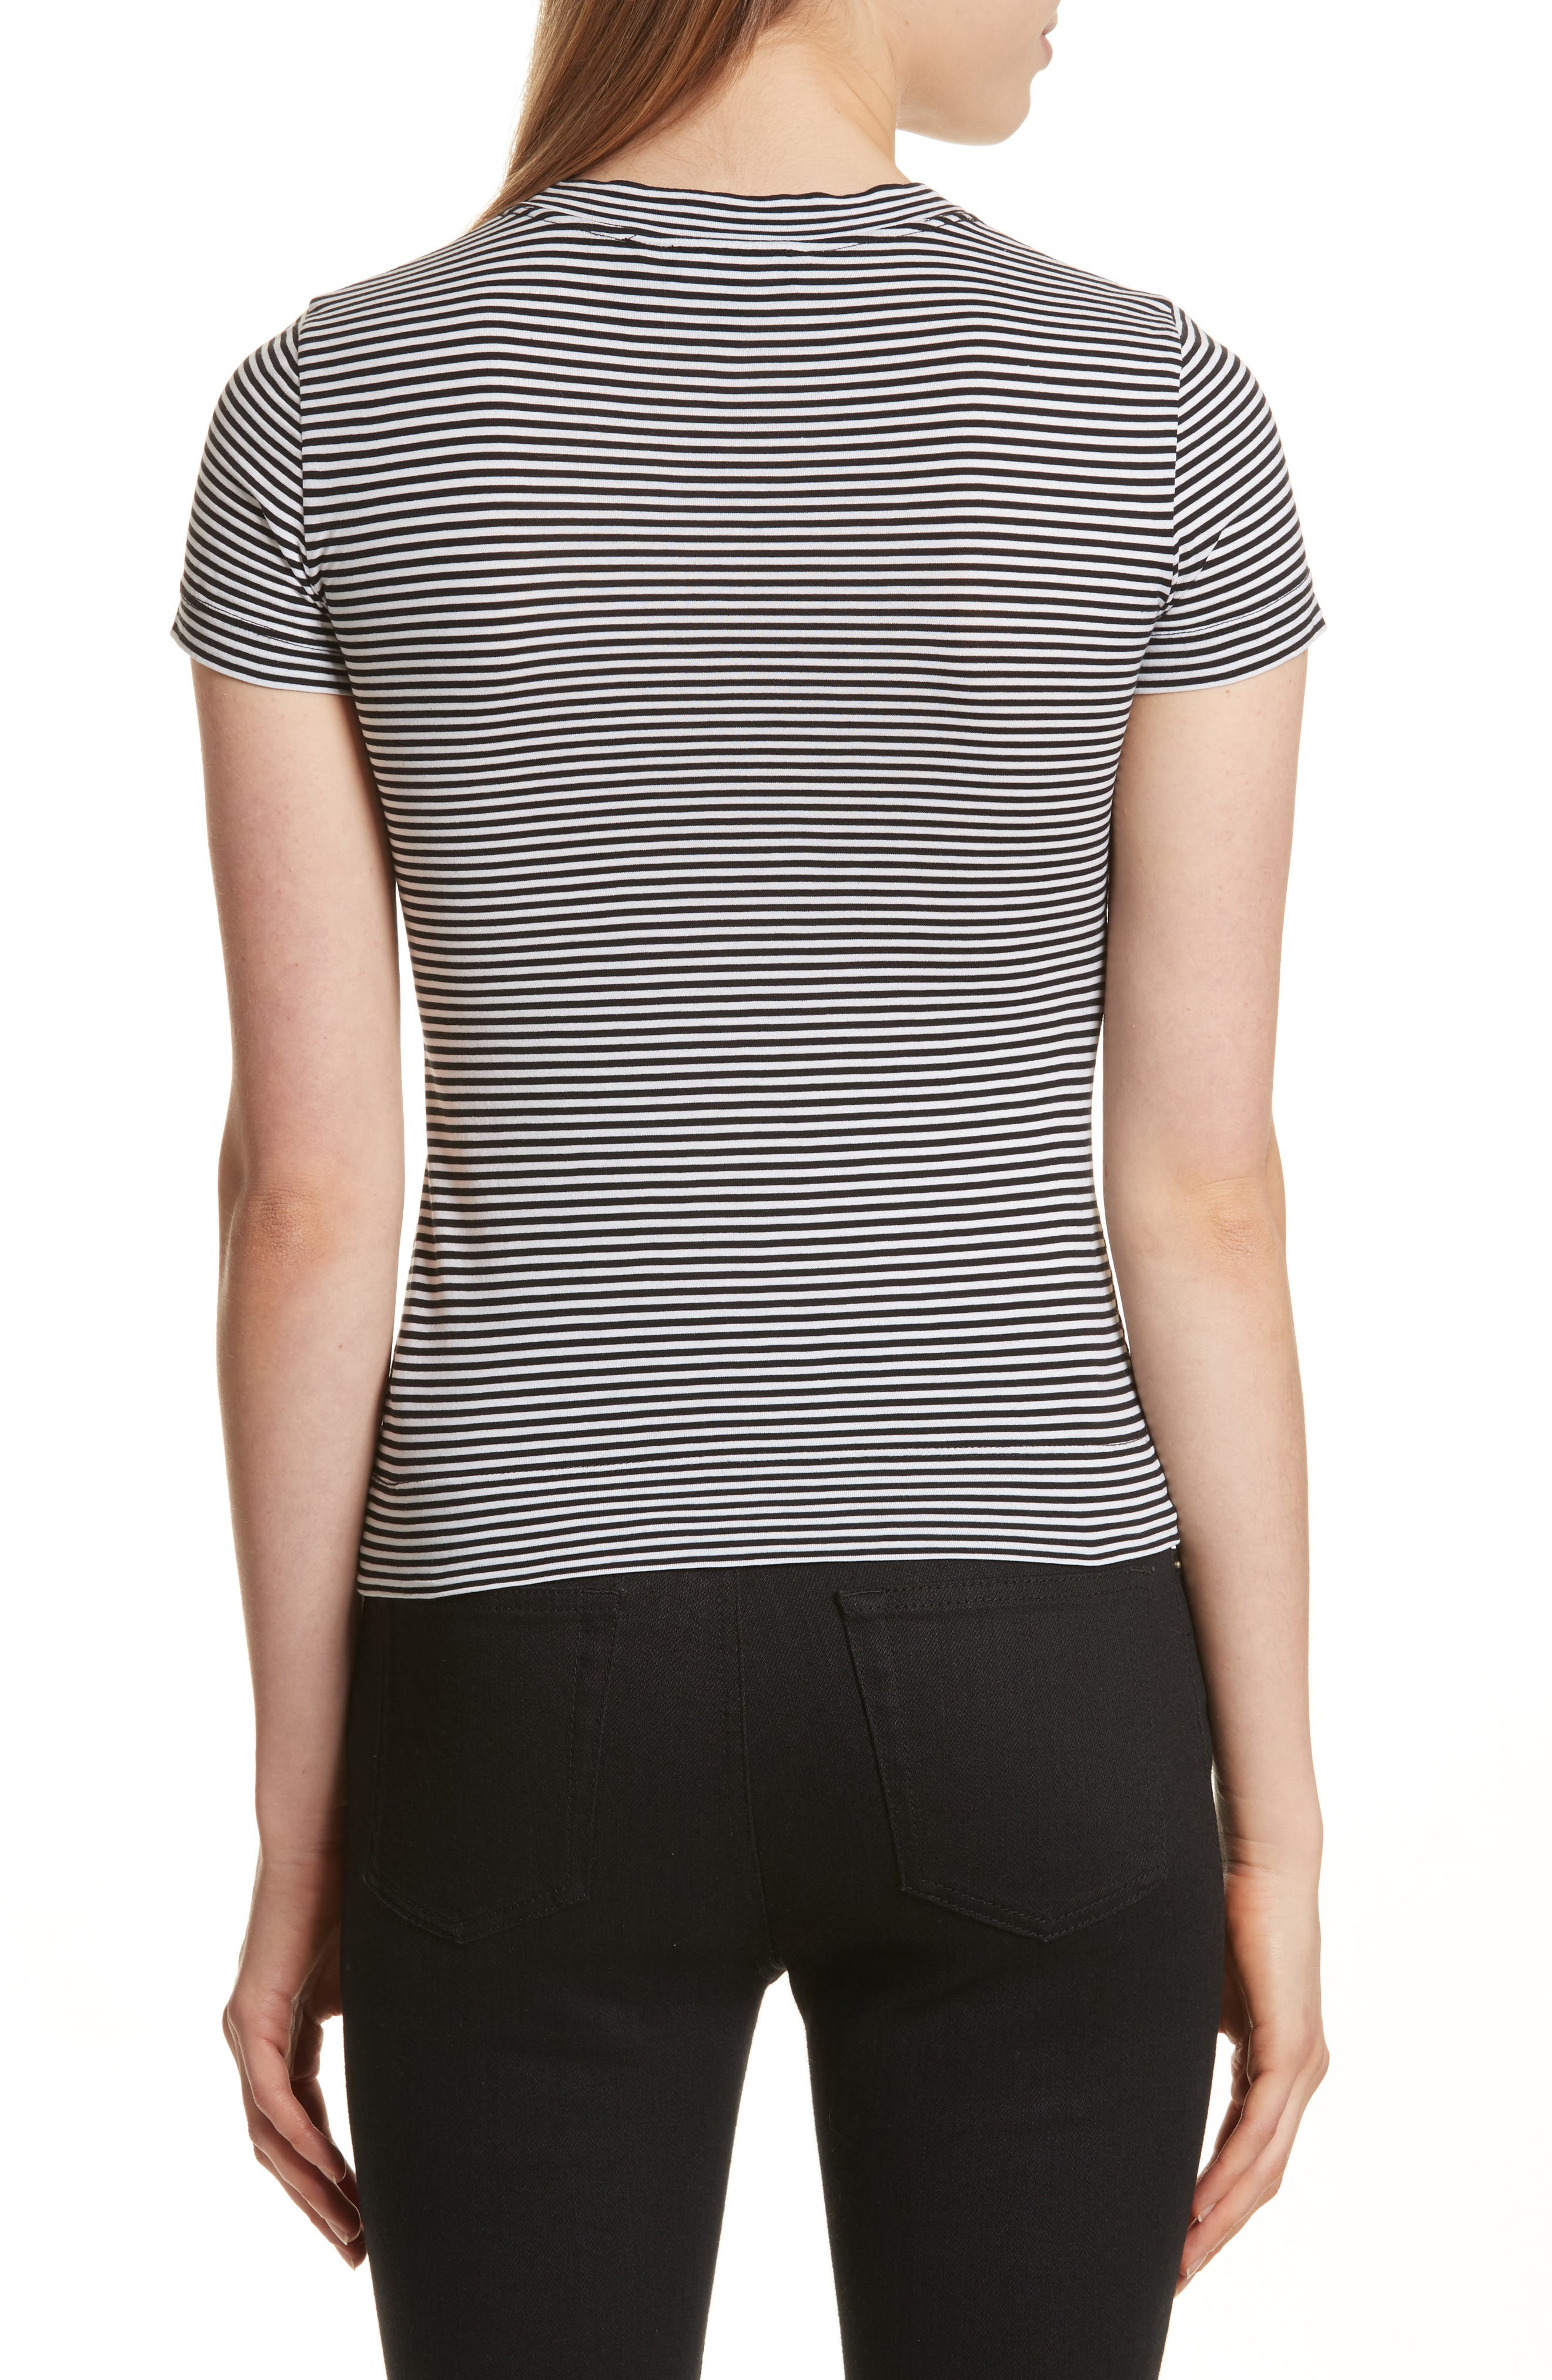 Apex Stripe Crop Tee,                             Alternate thumbnail 2, color,                             Black/ White